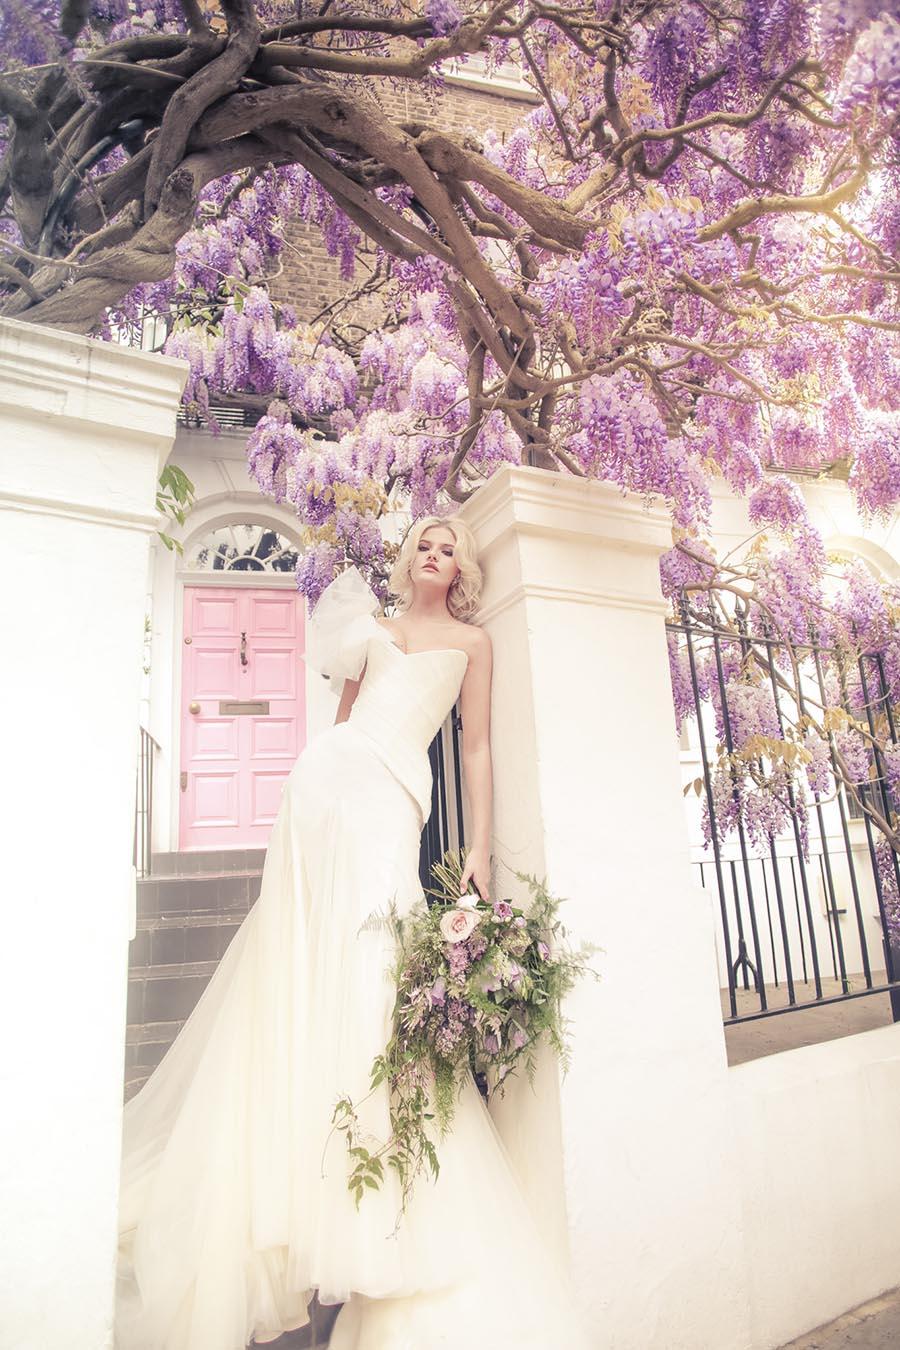 Chantal Mallett, Bridal Couture, 2017 Collection, Wisteria